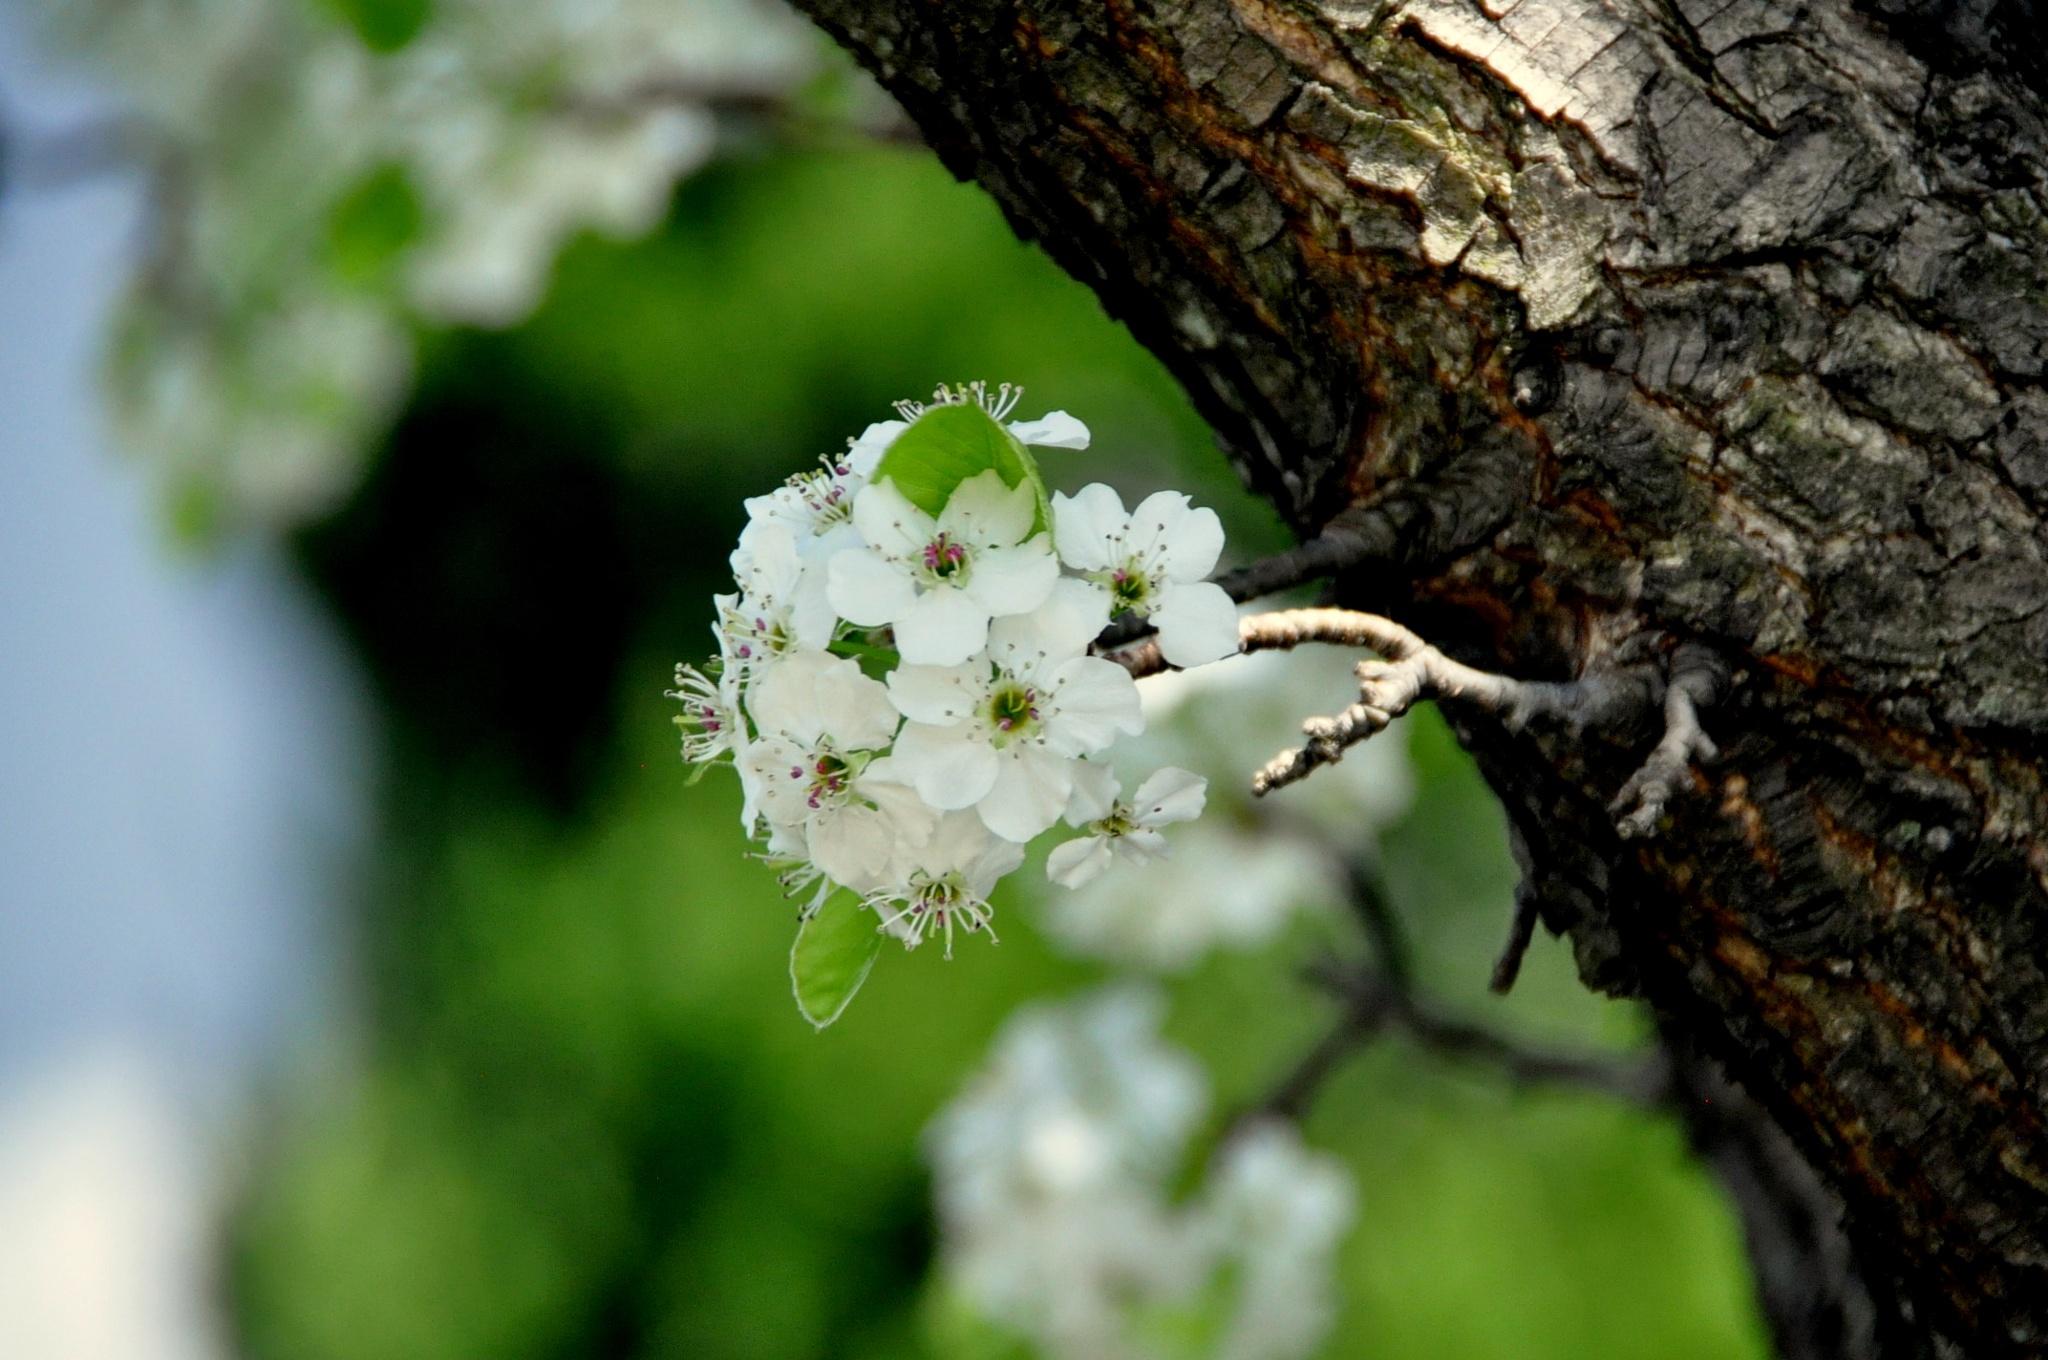 Spring Blossom 2 by HKS Images